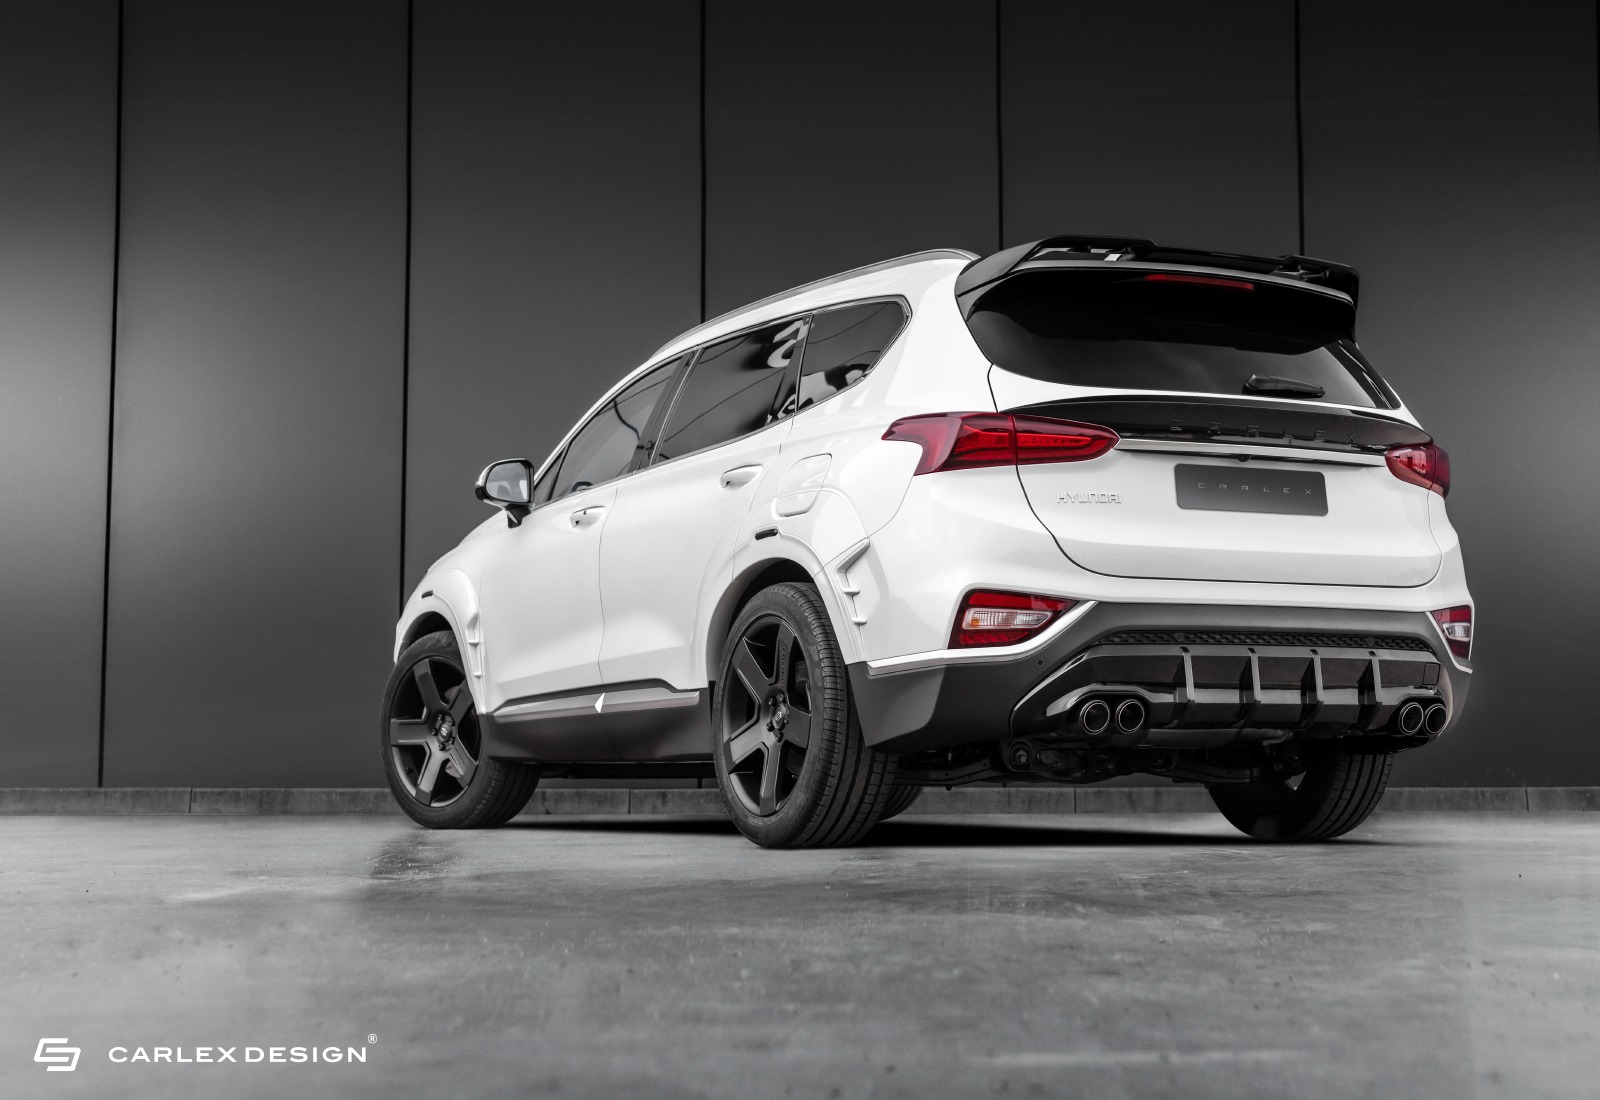 Hyundai-Santa-Fe-by-Carlex-Design-11